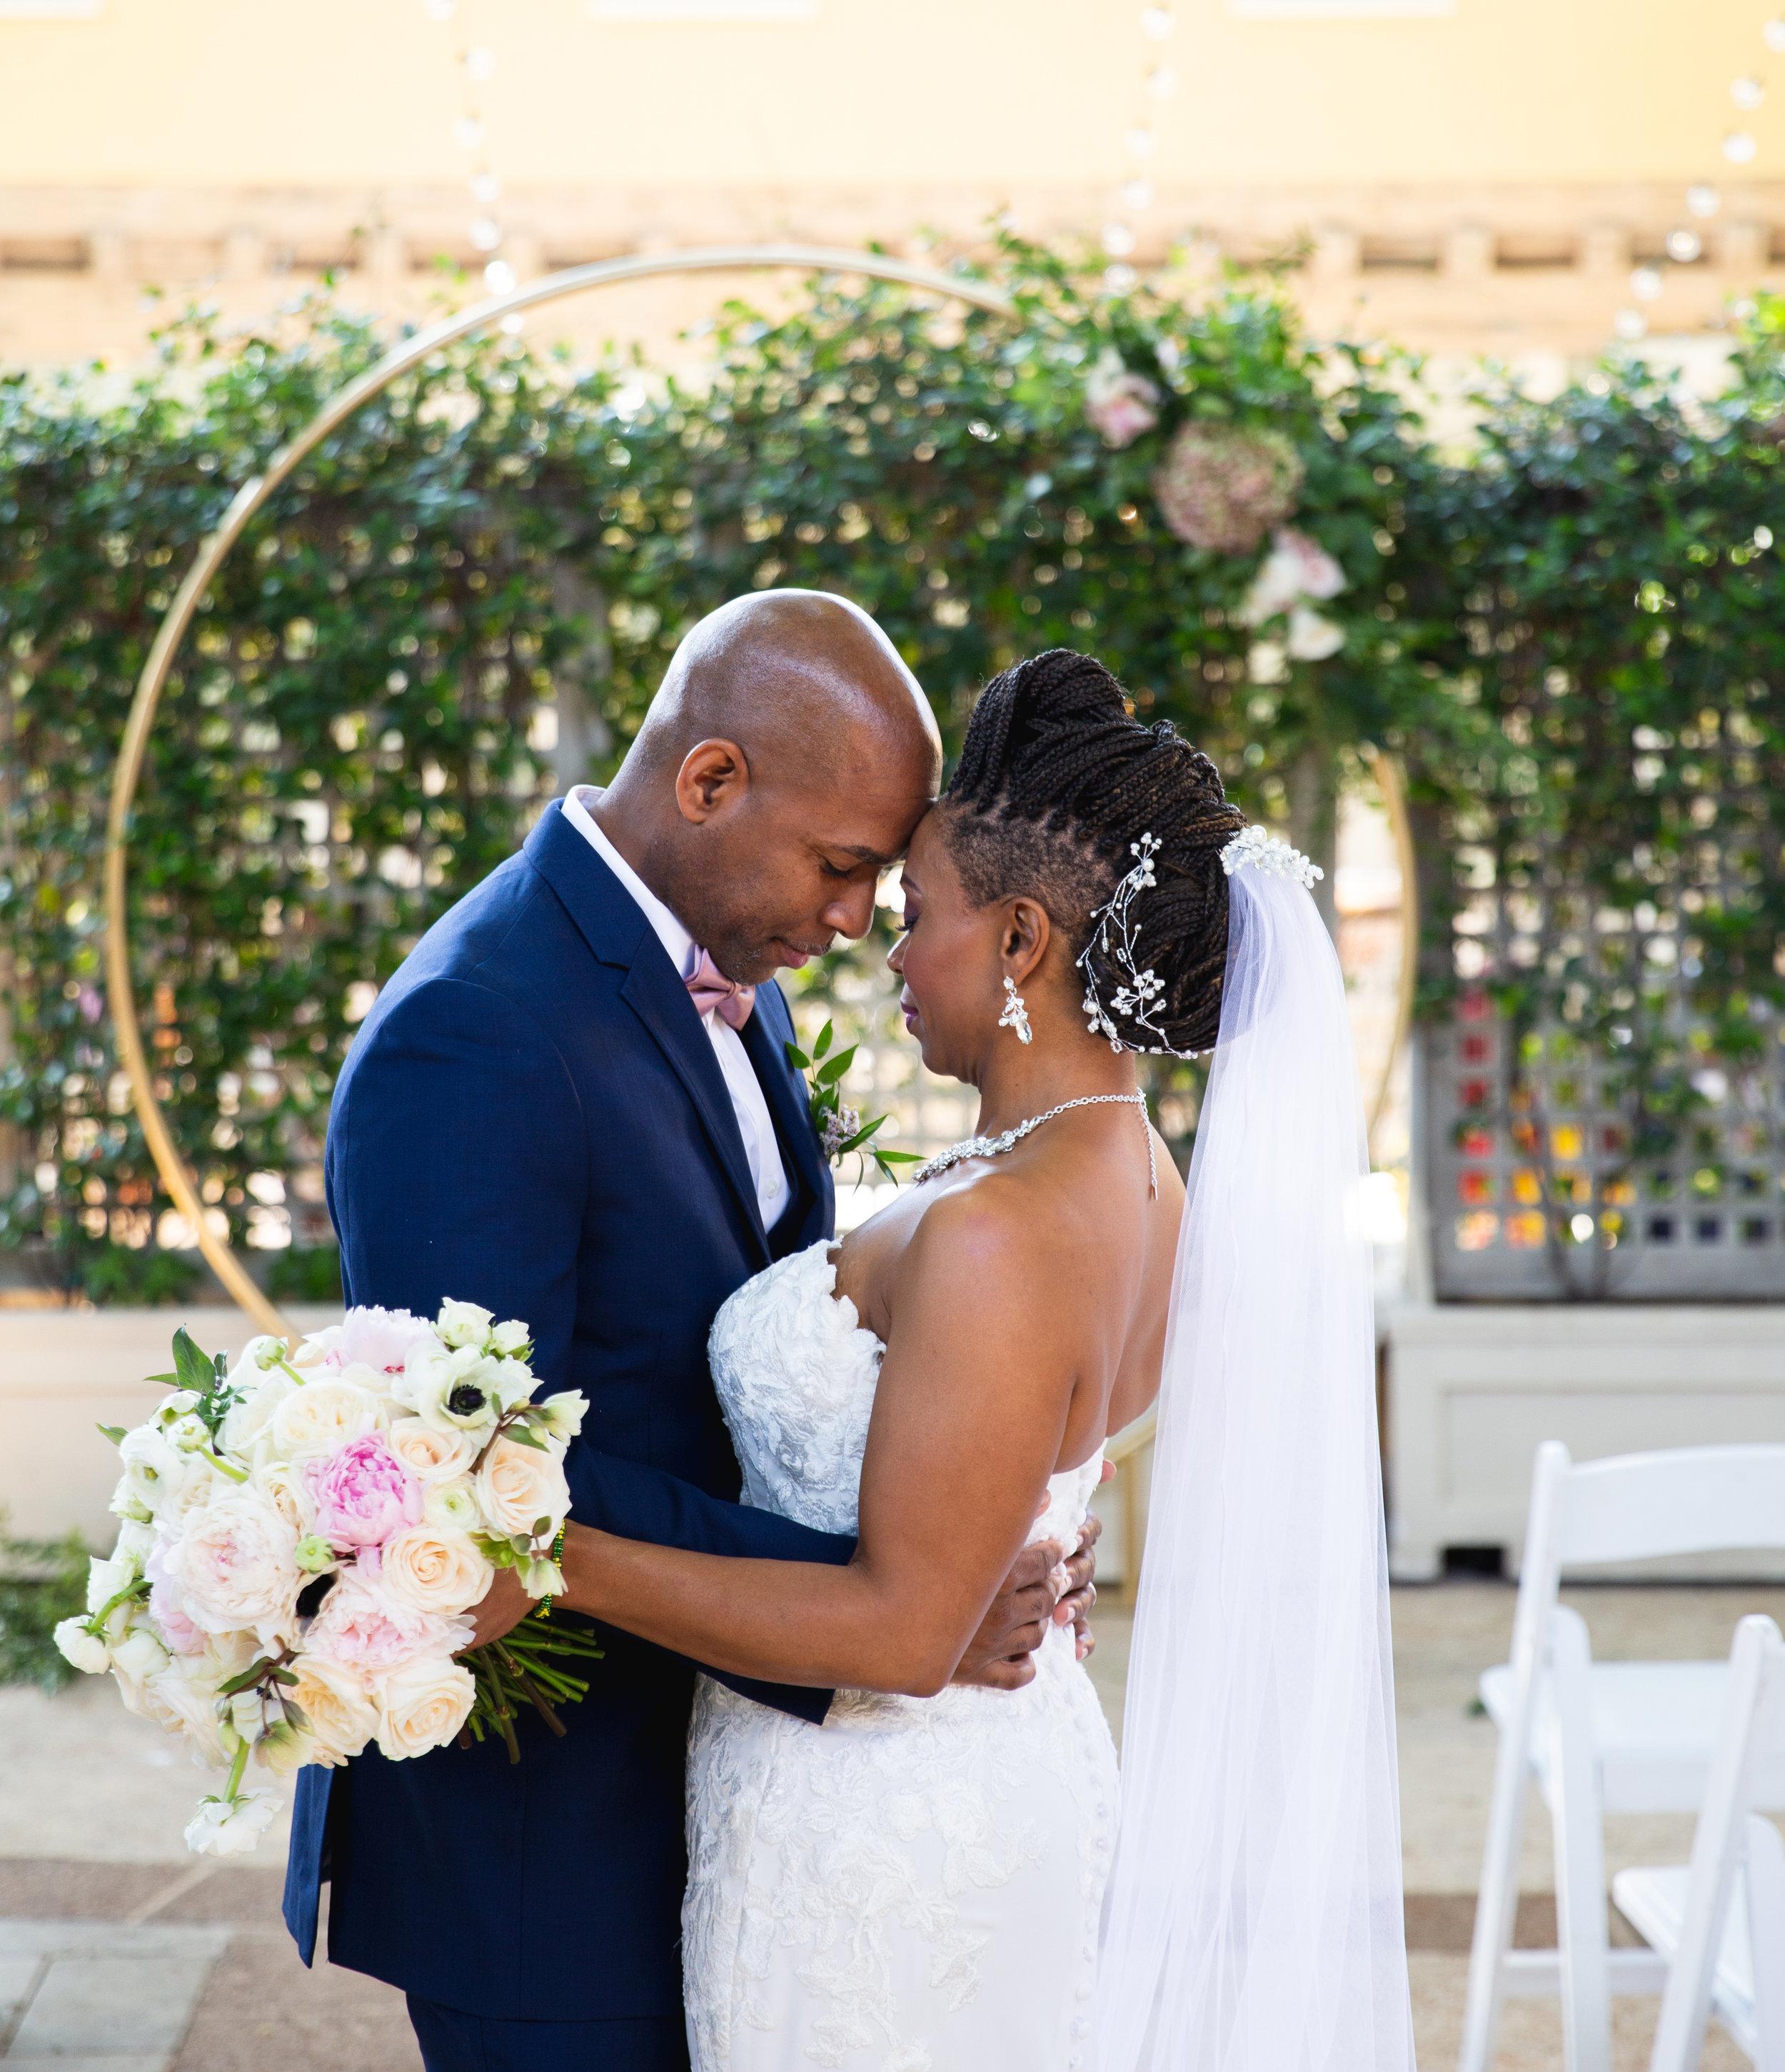 The Addison Boca Raton, South Florida Wedding, Bridal Bouquet, Wedding Portrait, Garden Wedding.jpg